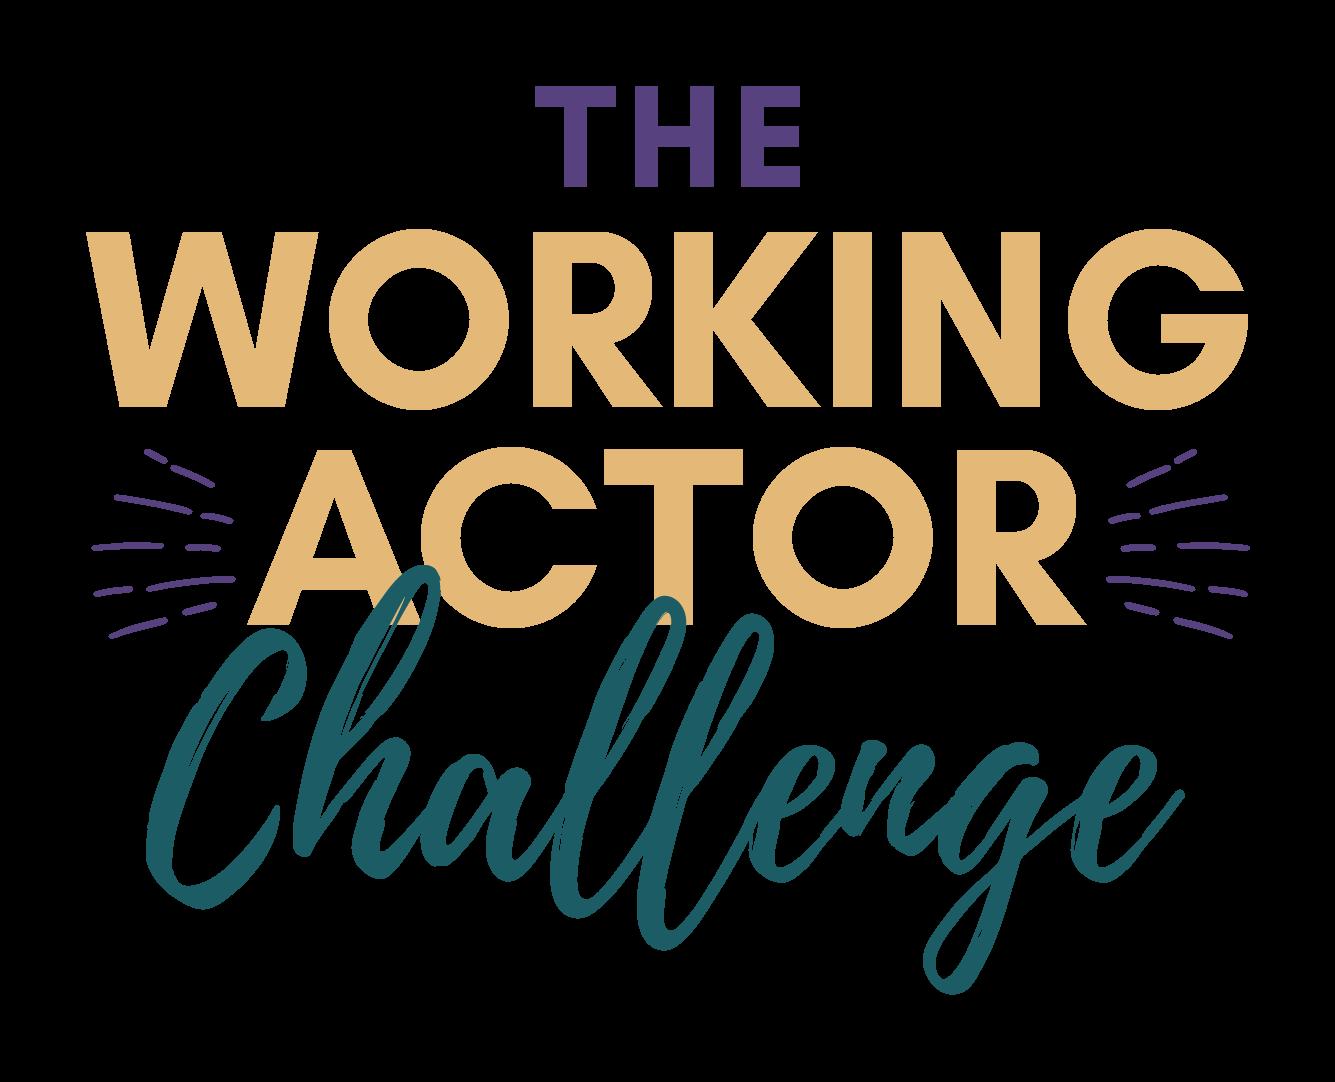 The Working Actor Challenge Logo